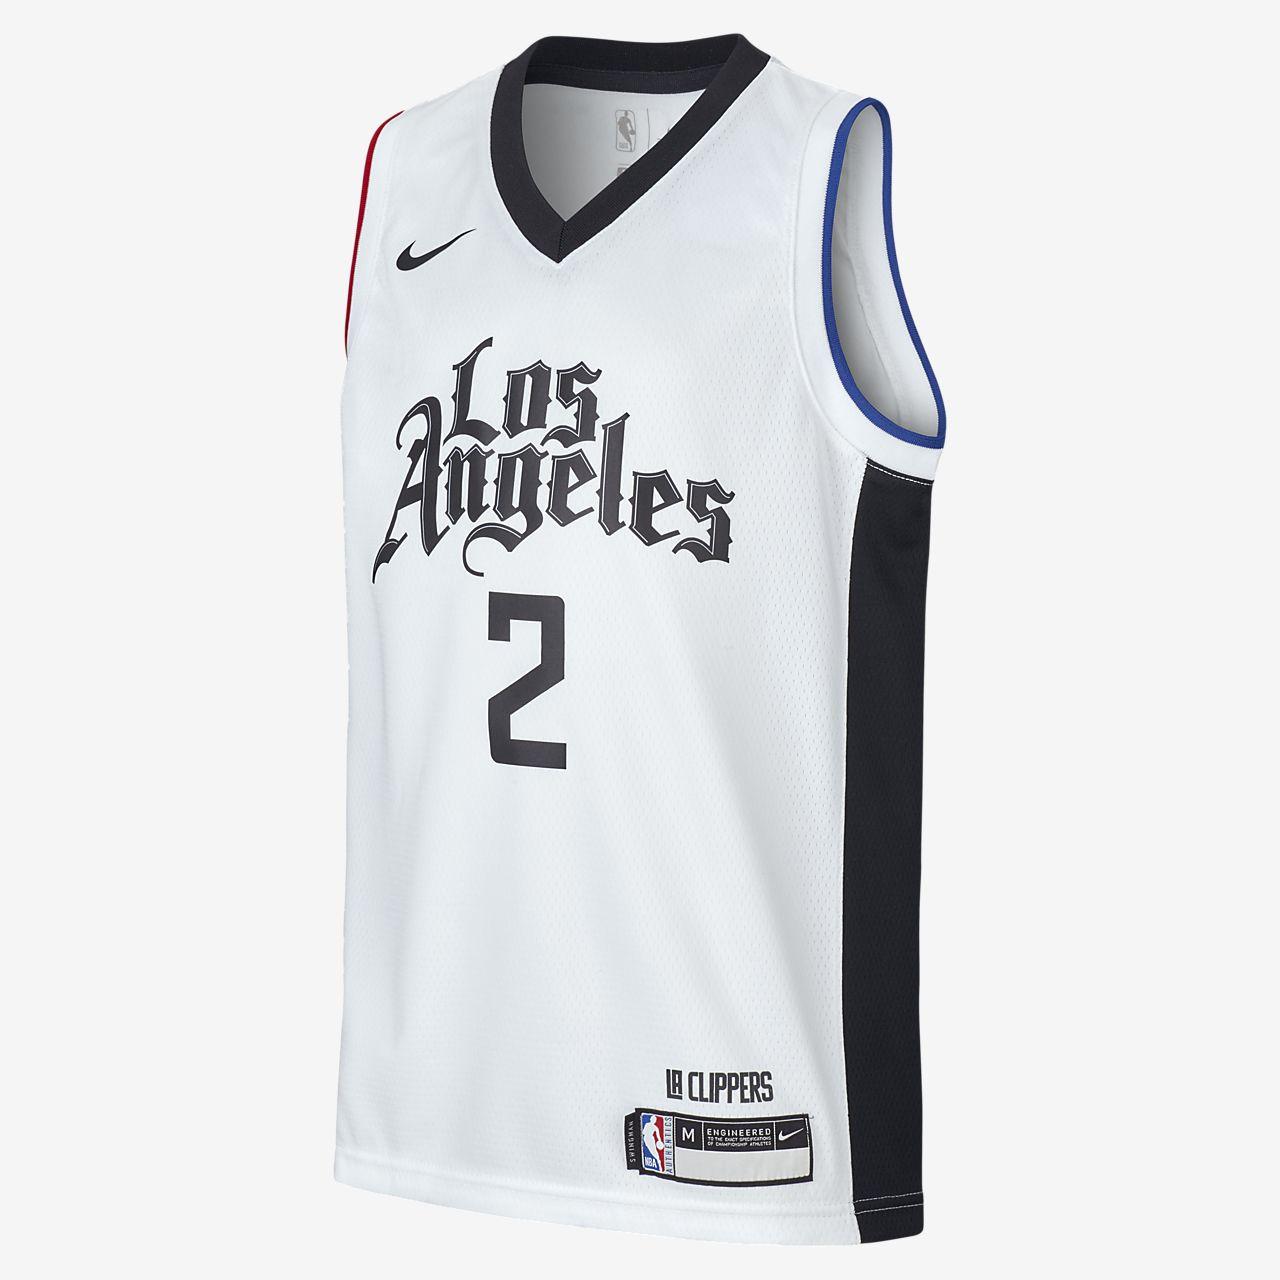 Dres Nike NBA Swingman Kawhi Leonard Clippers City Edition pro větší děti